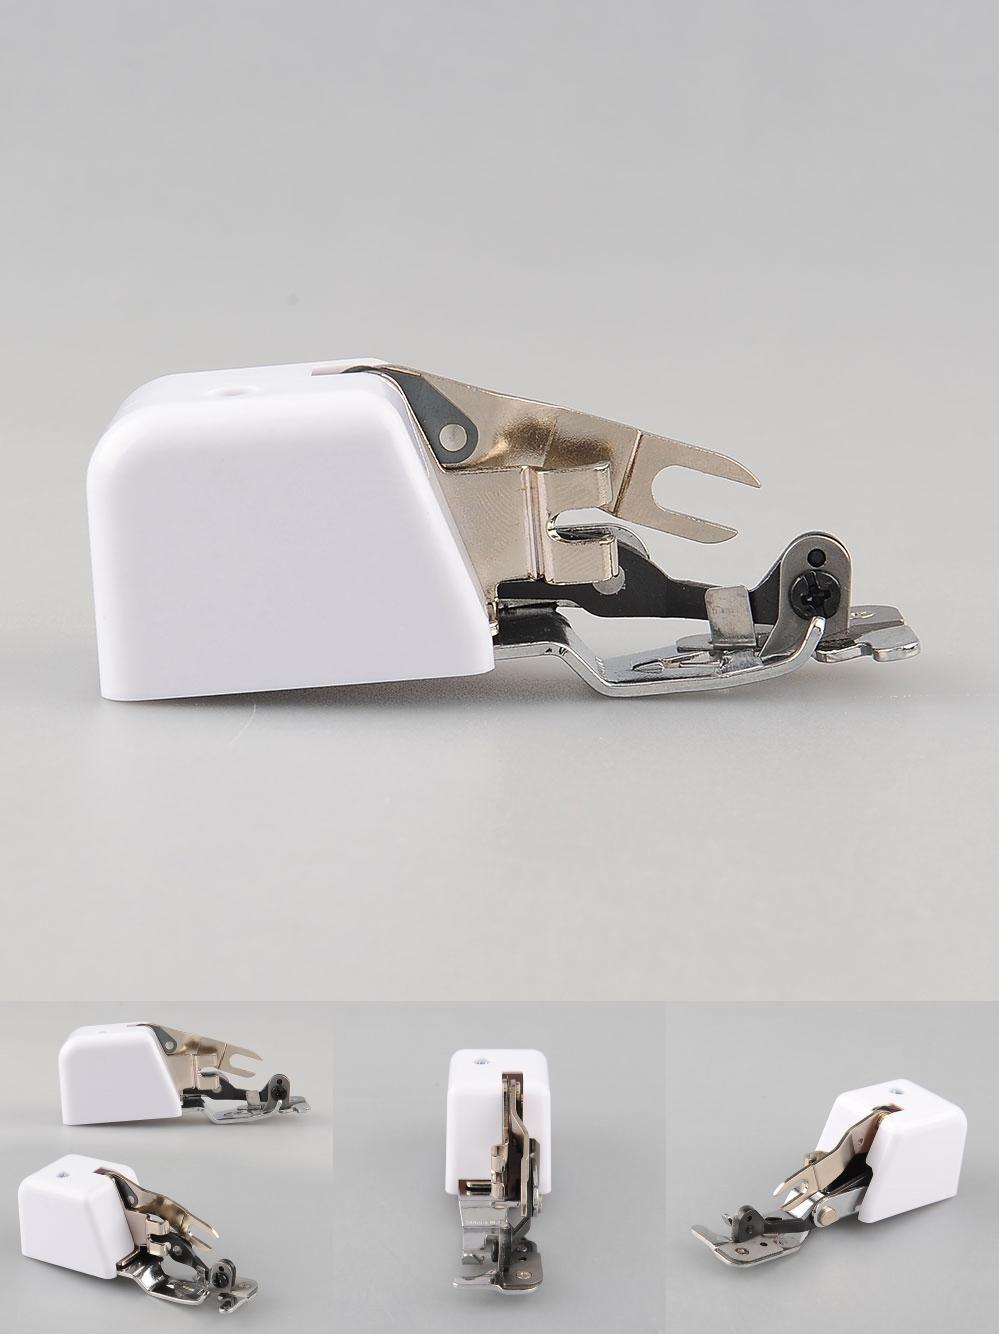 Visit to Buy] 1 Side Cutter Overlock Presser Feet Zig Zag Sewing ...